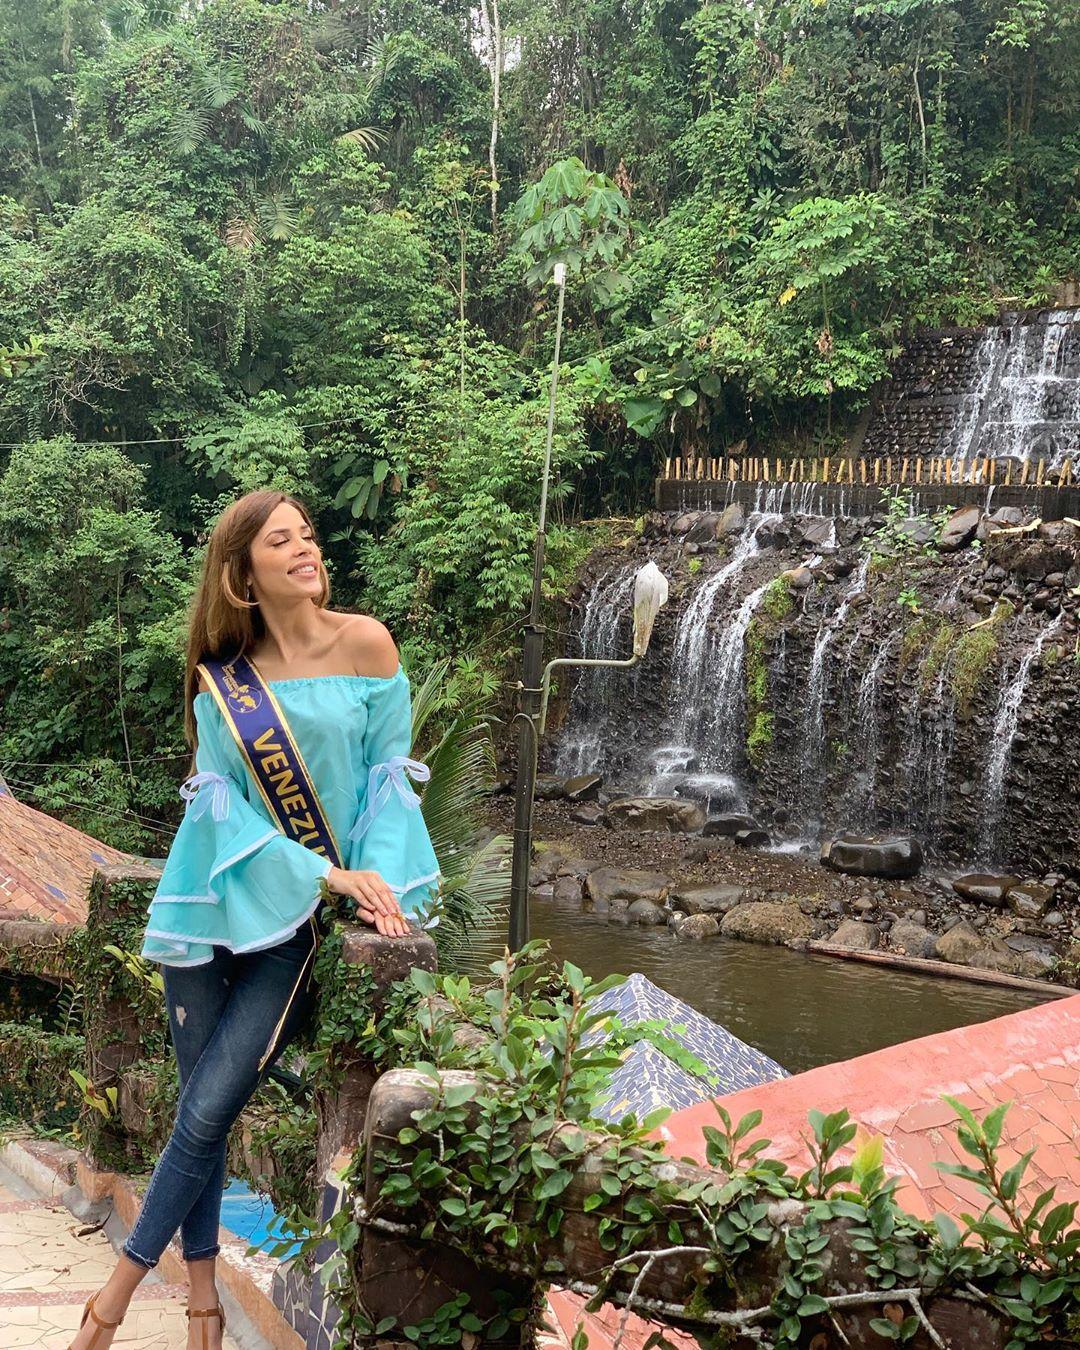 maria jose bracho, miss venezuela continentes unidos 2019. - Página 3 69902510